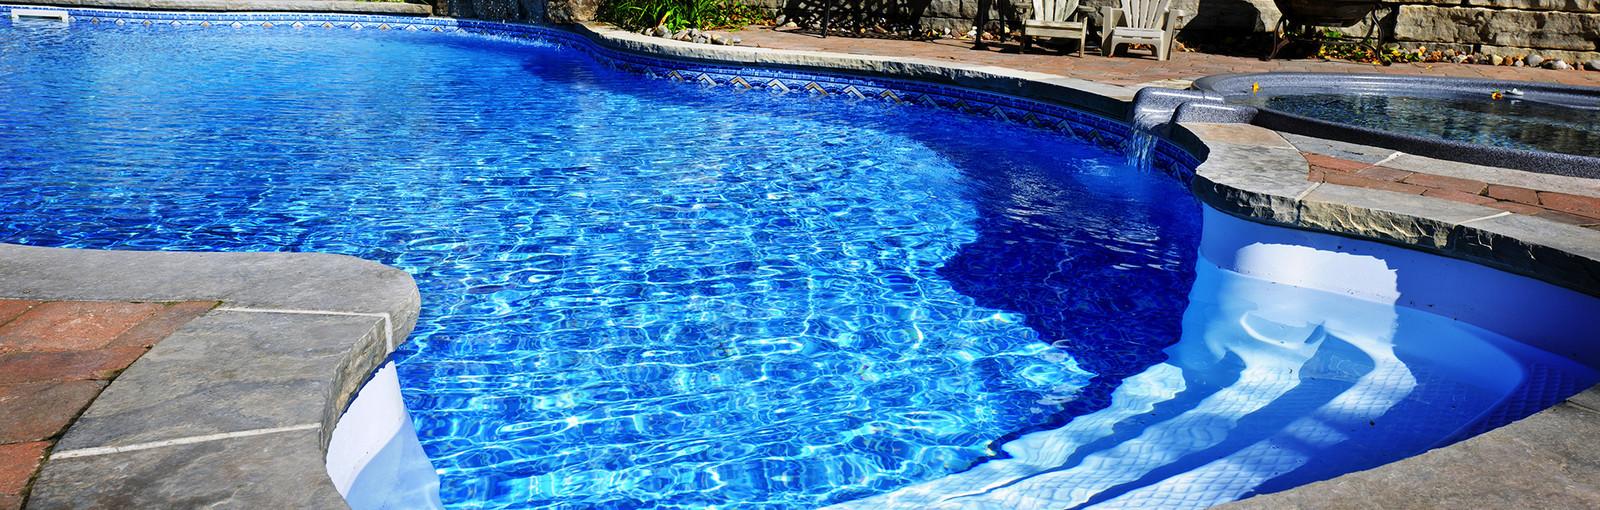 Complete Pool Heaters